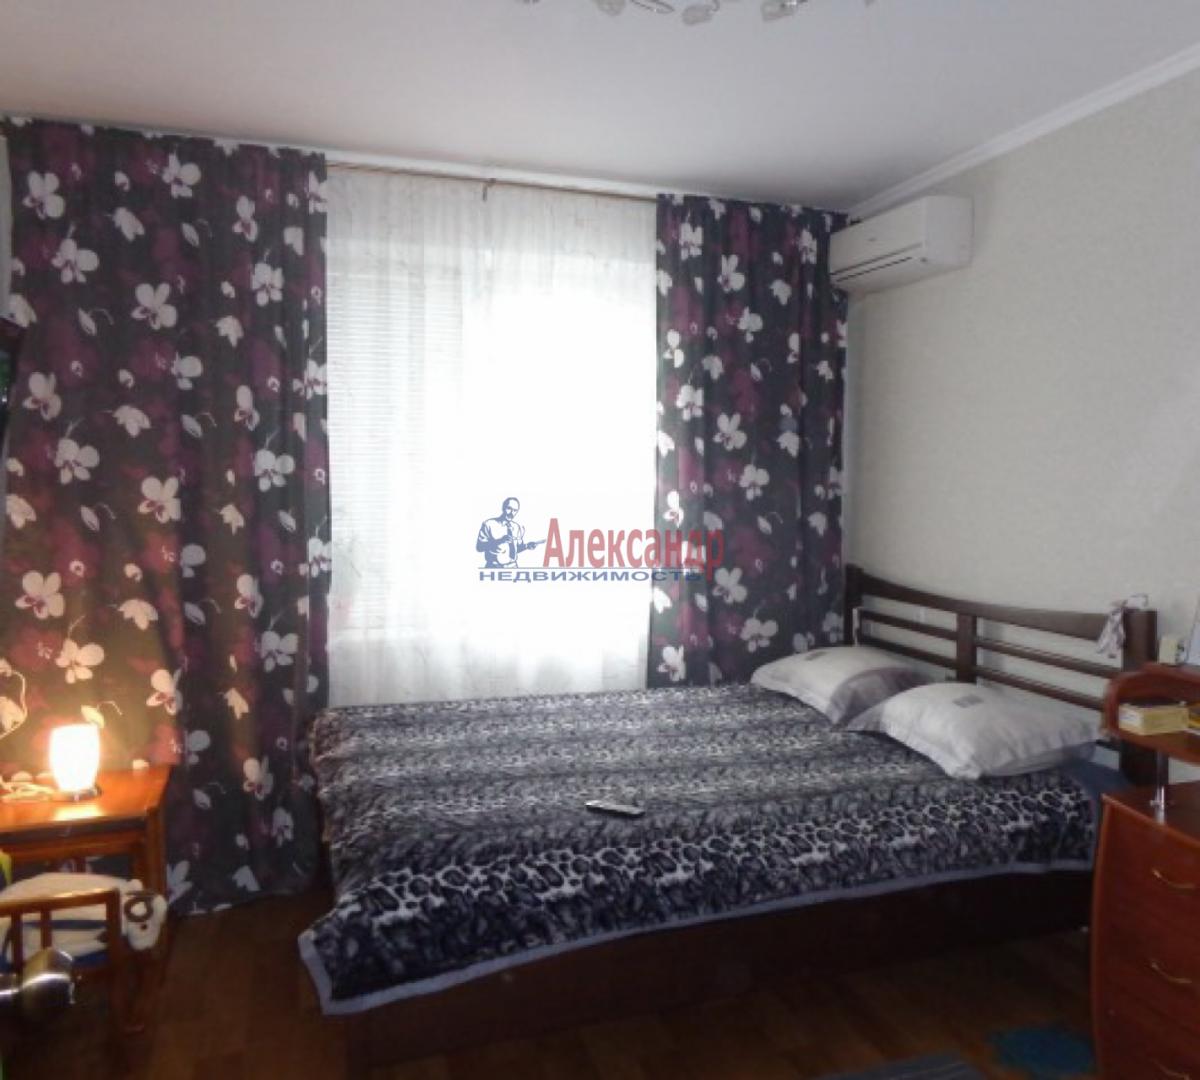 2-комнатная квартира (54м2) в аренду по адресу Ветеранов пр., 122— фото 2 из 5